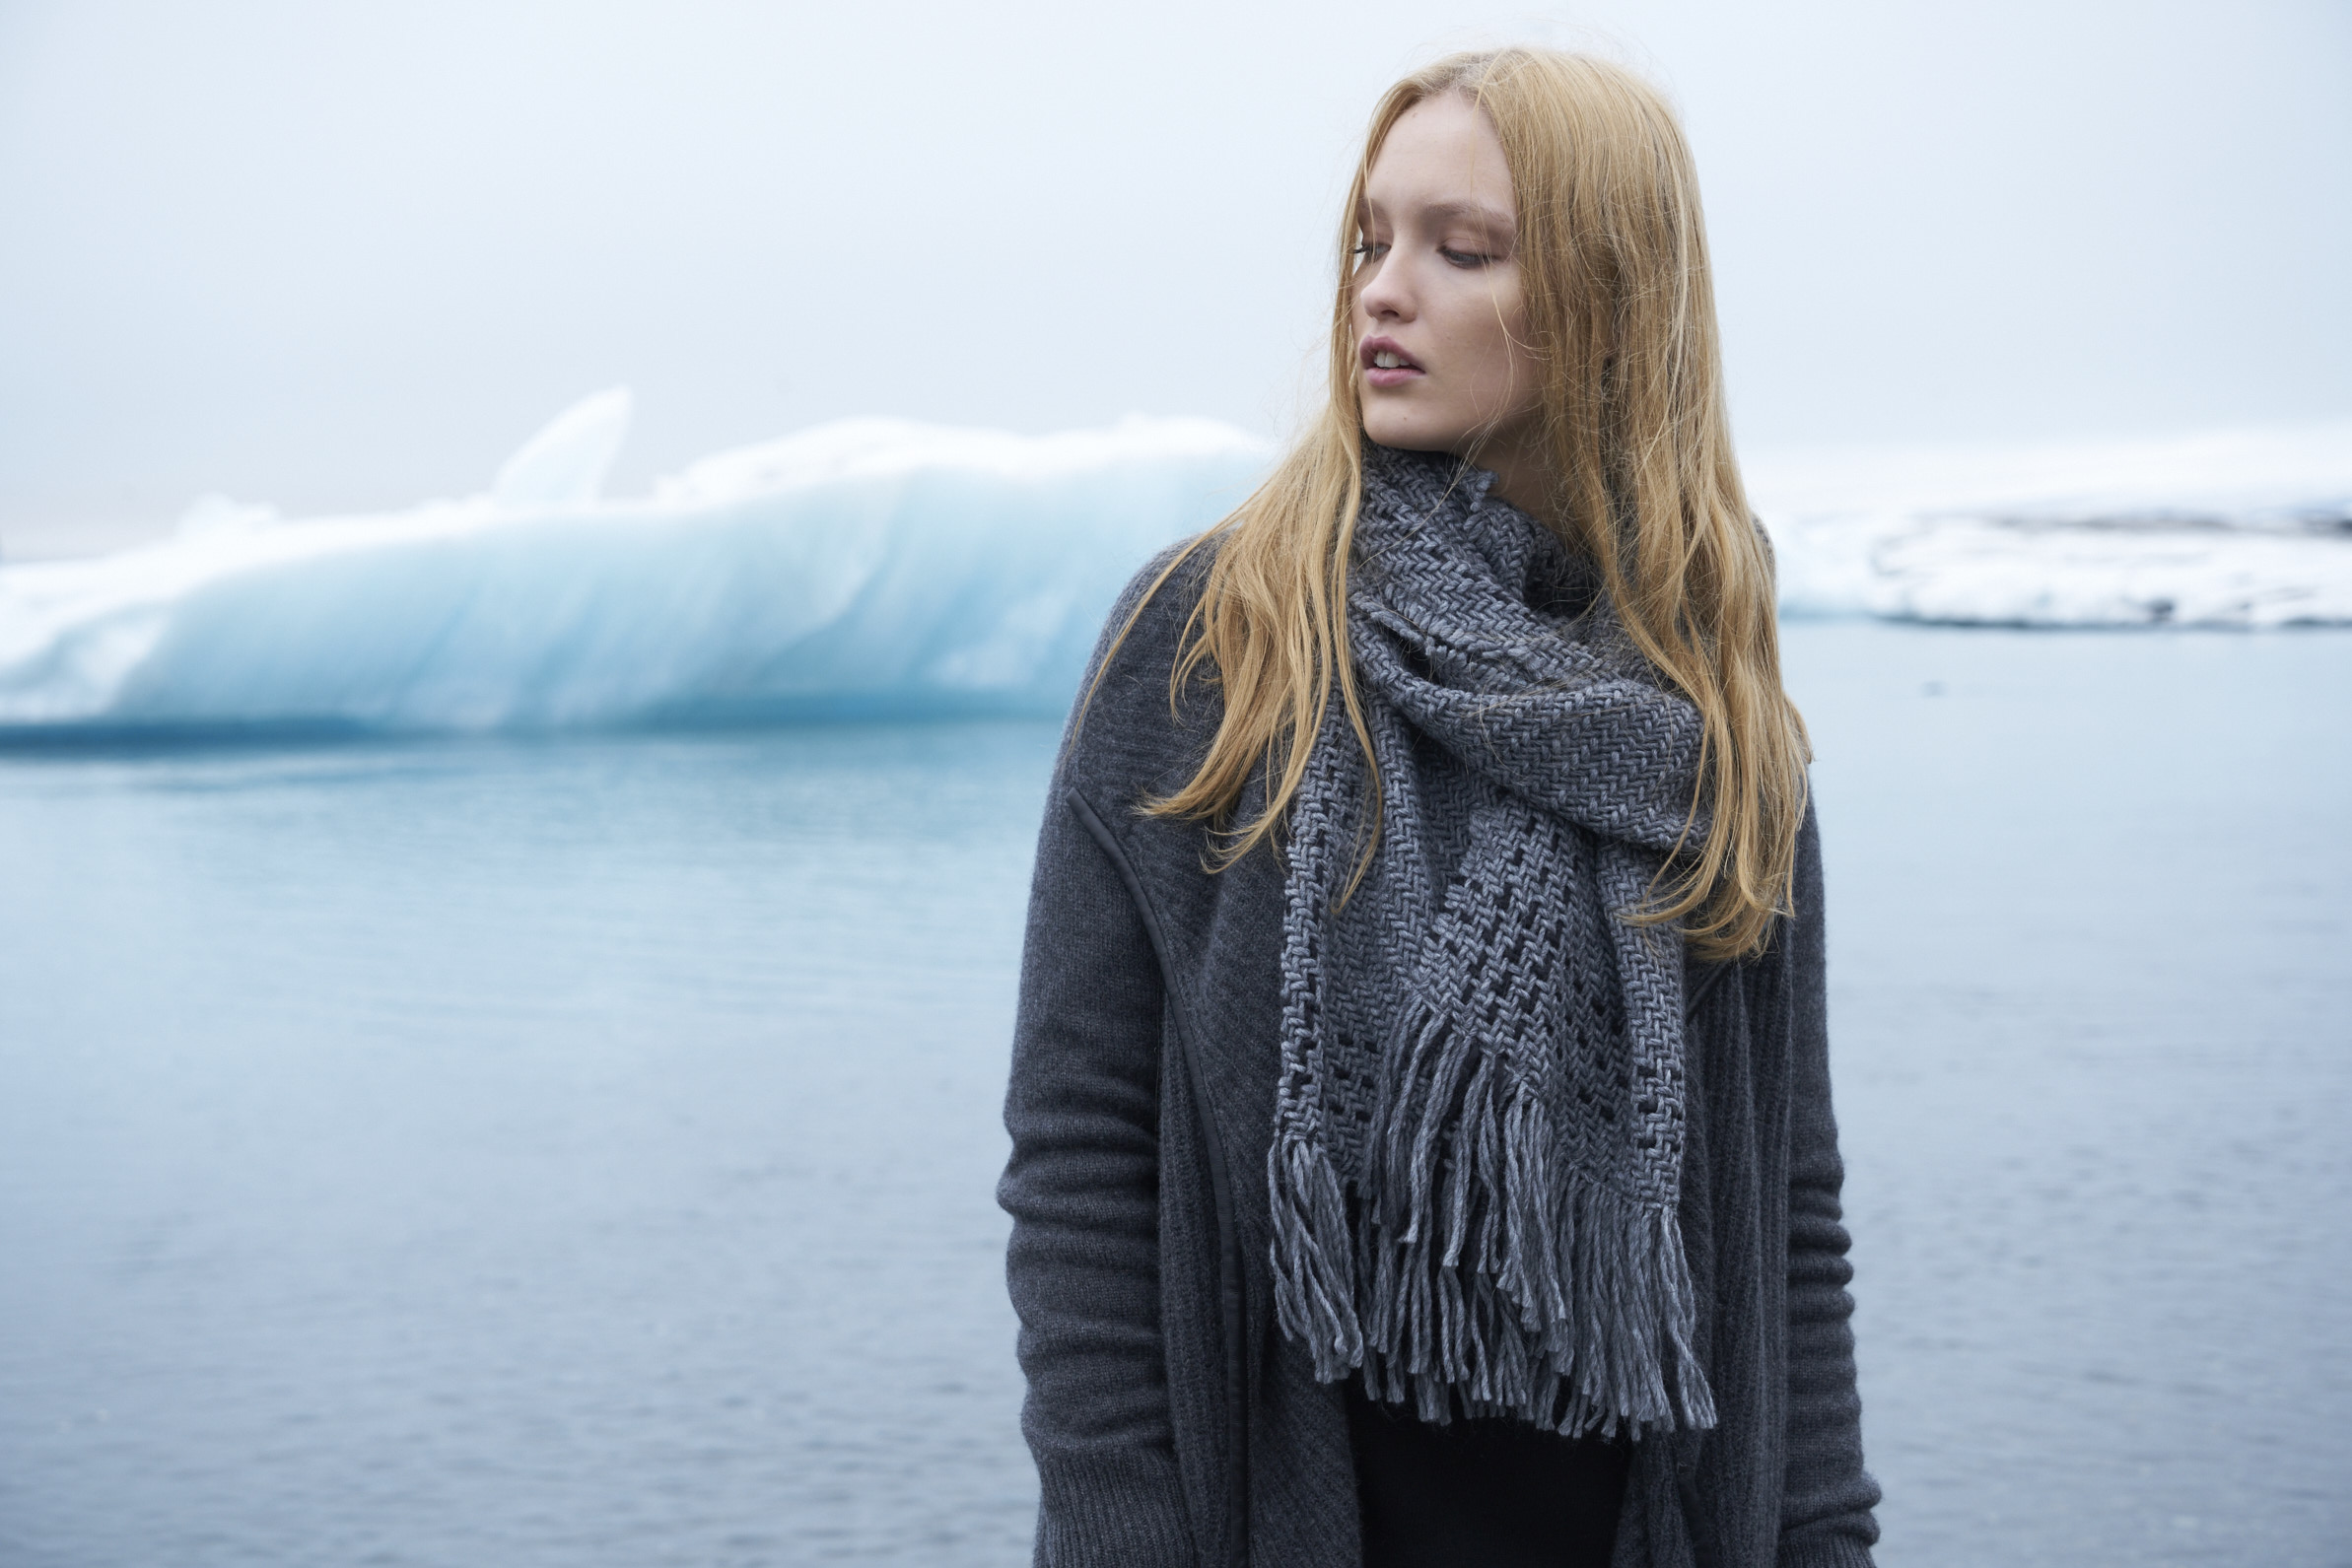 019_Iceland Omni0088.jpg